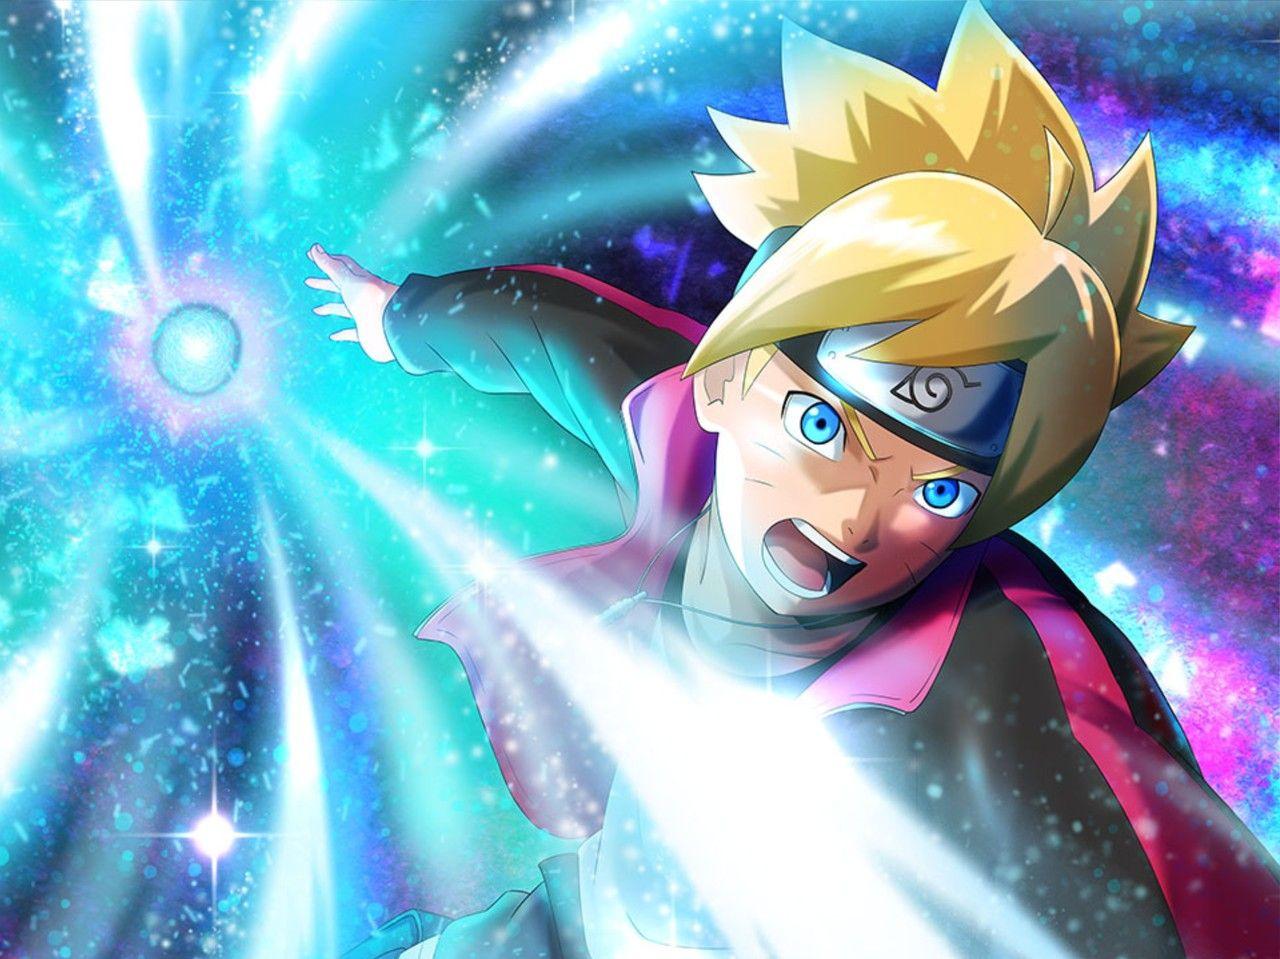 Uzumaki Boruto Boruto Naruto Next Generations Ilustrator Gambar Naga Gambar Karakter